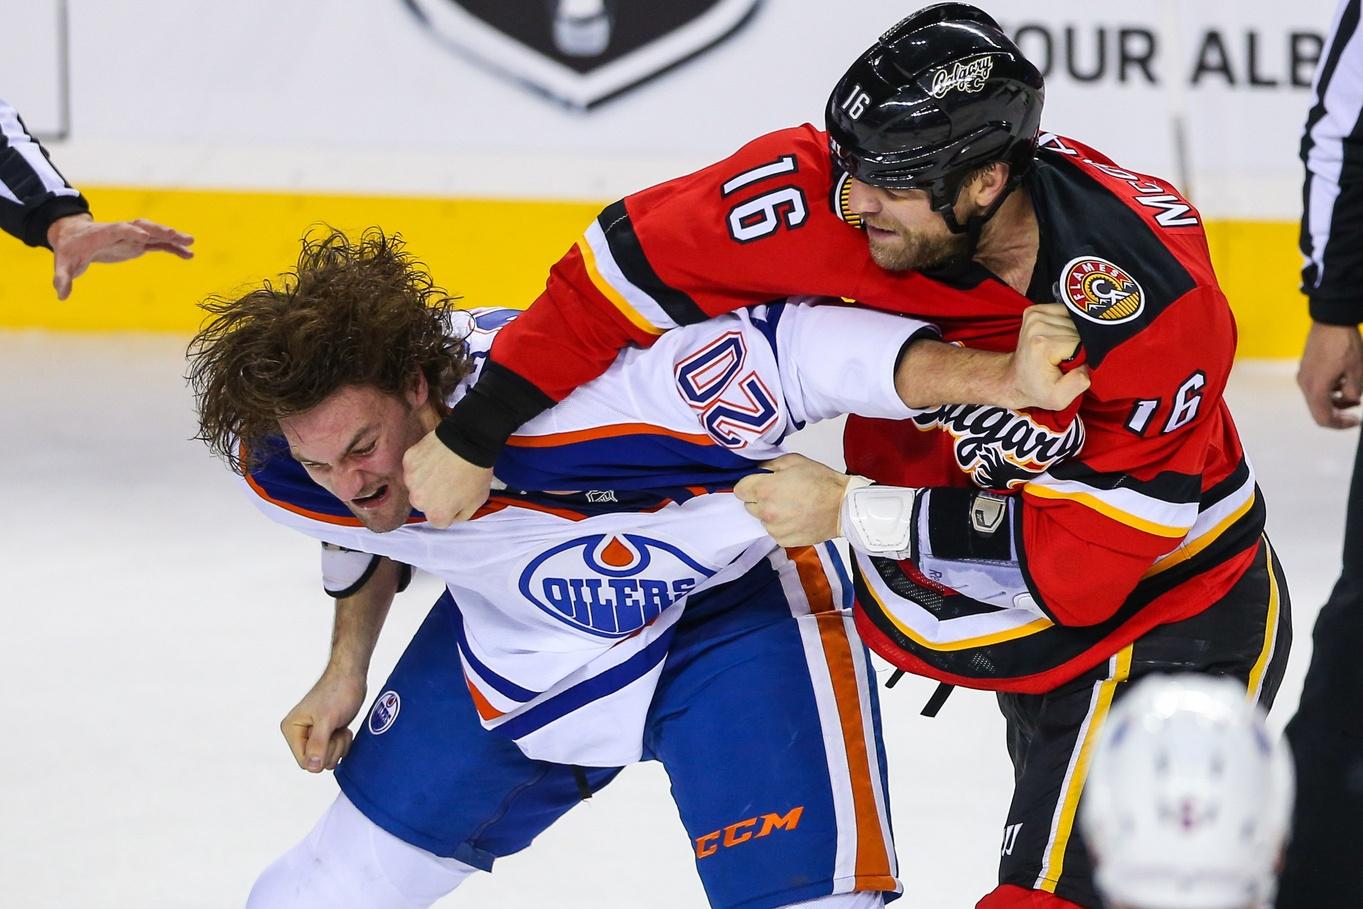 hockey violence Hockey anti-violence petition 423 likes dr ellemberg & me salehabadi-fouques: battons nous contre la violence au hockey-lets fight violence in hockey.